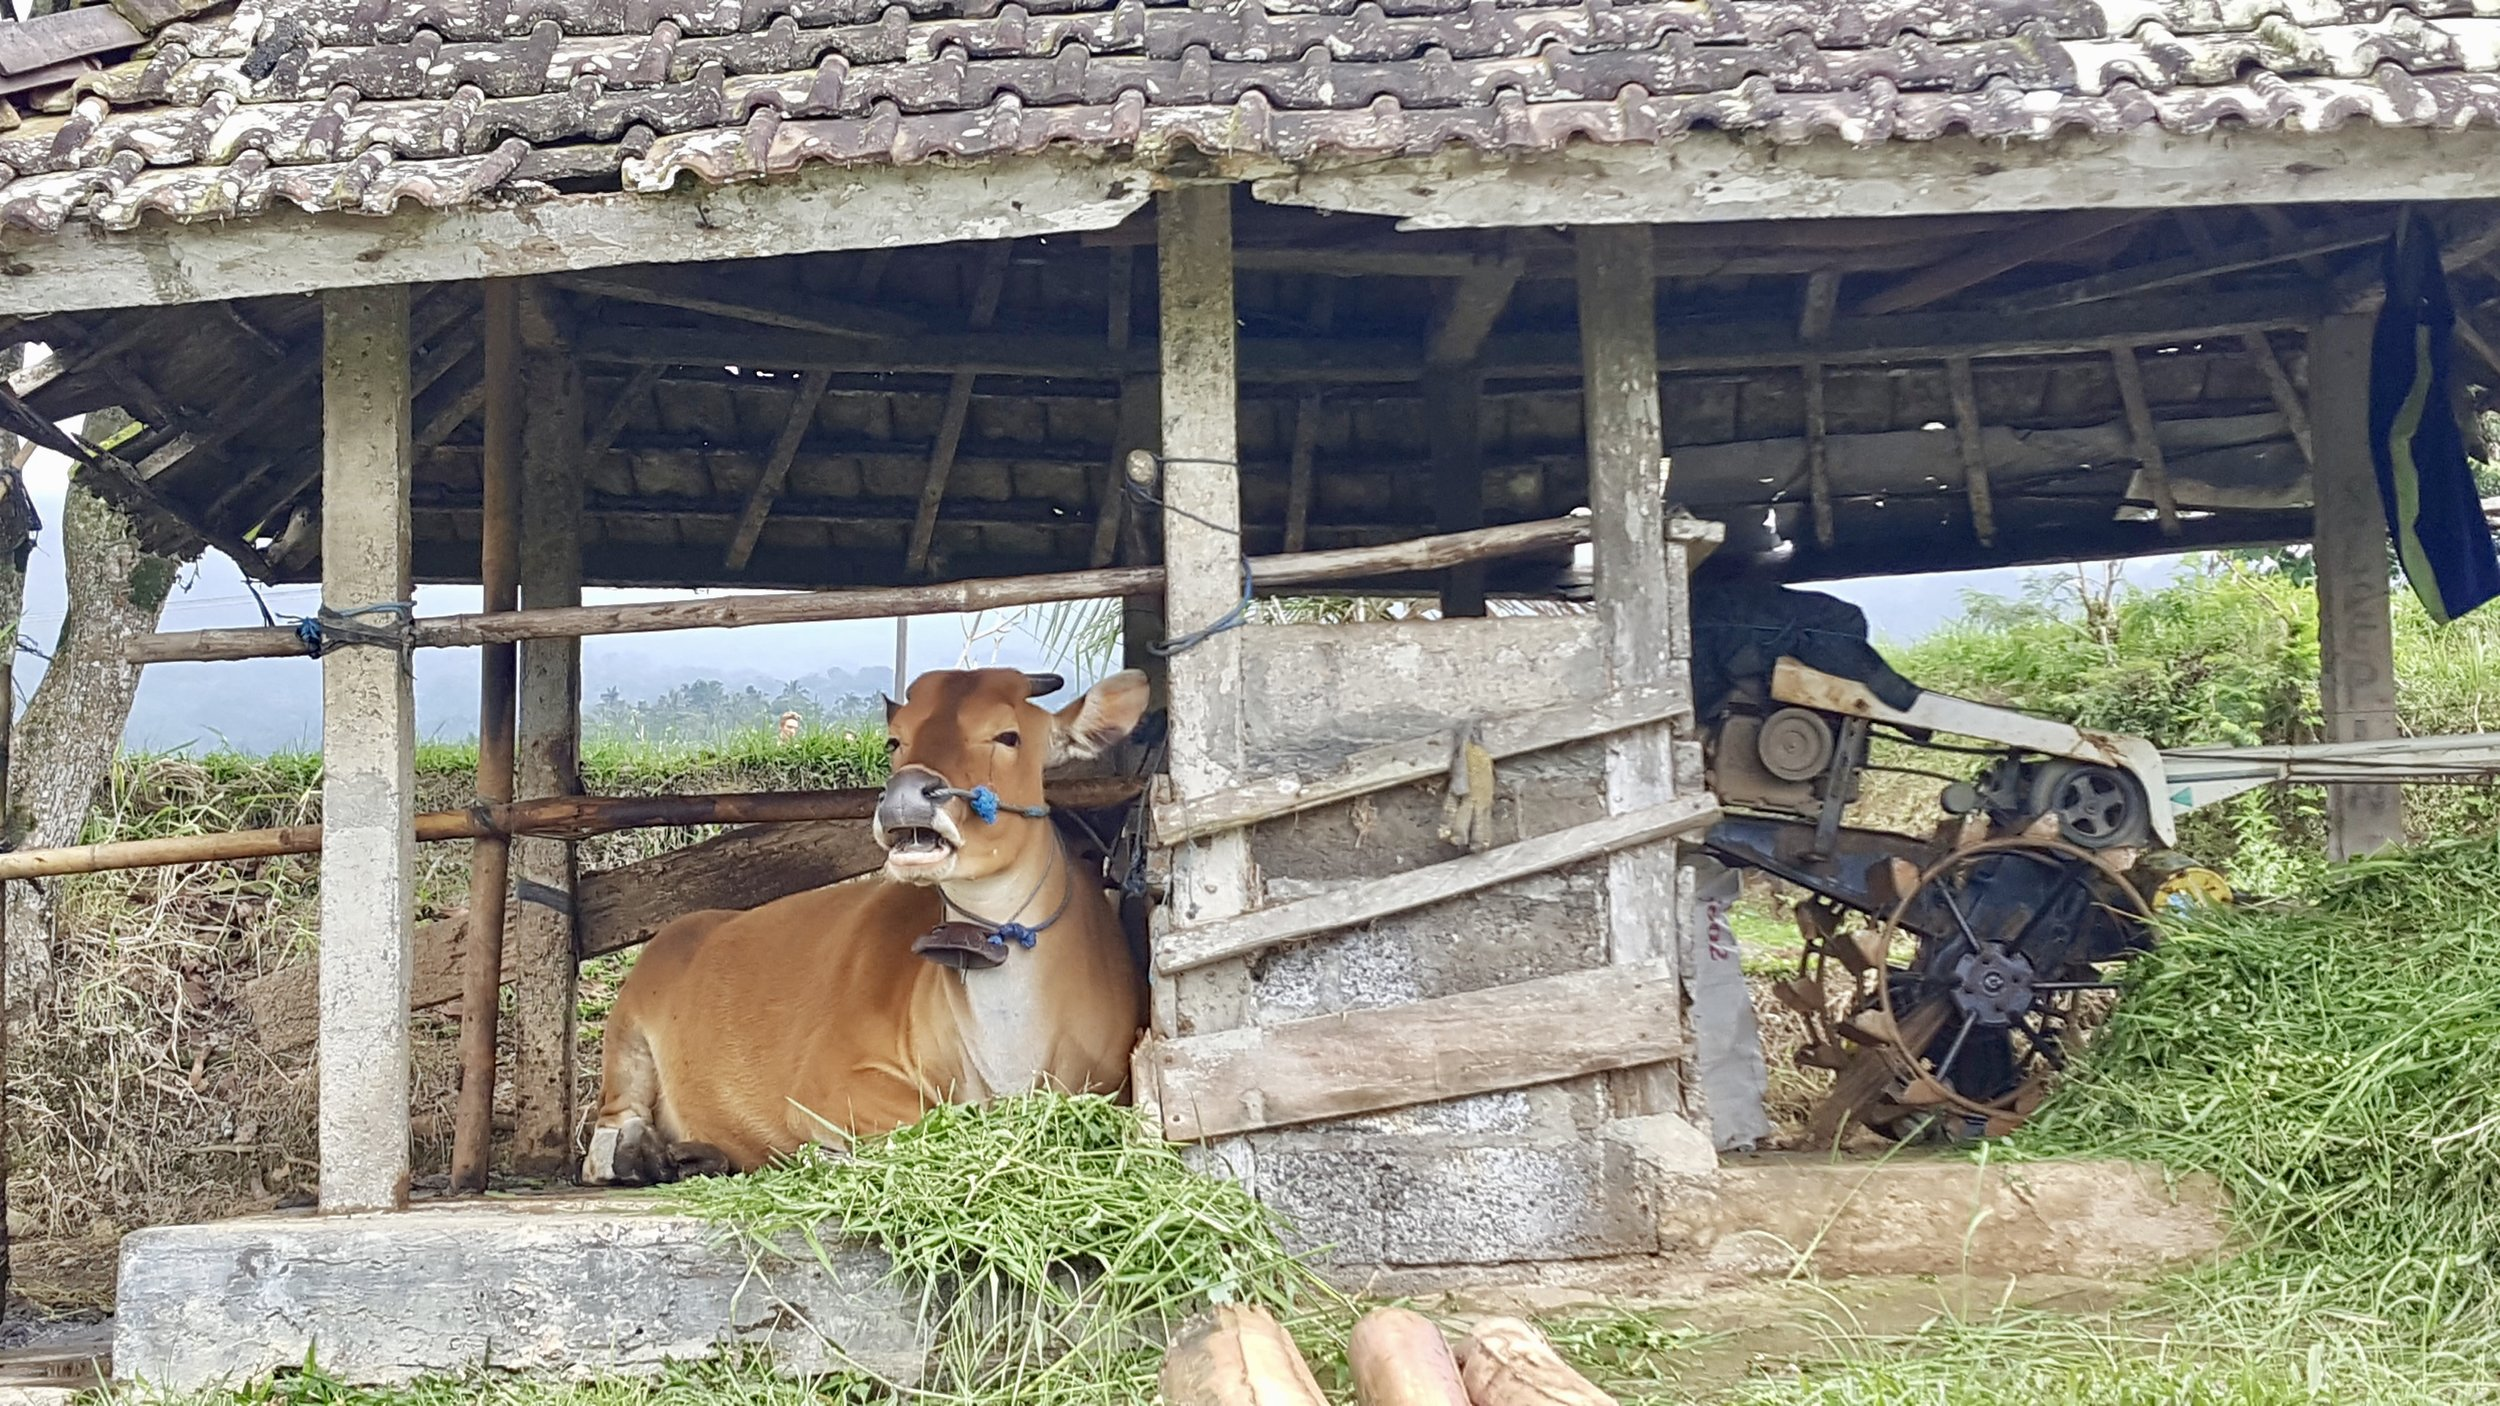 Cow at Jatiluwih Rice Terraces, Bali, Indonesia